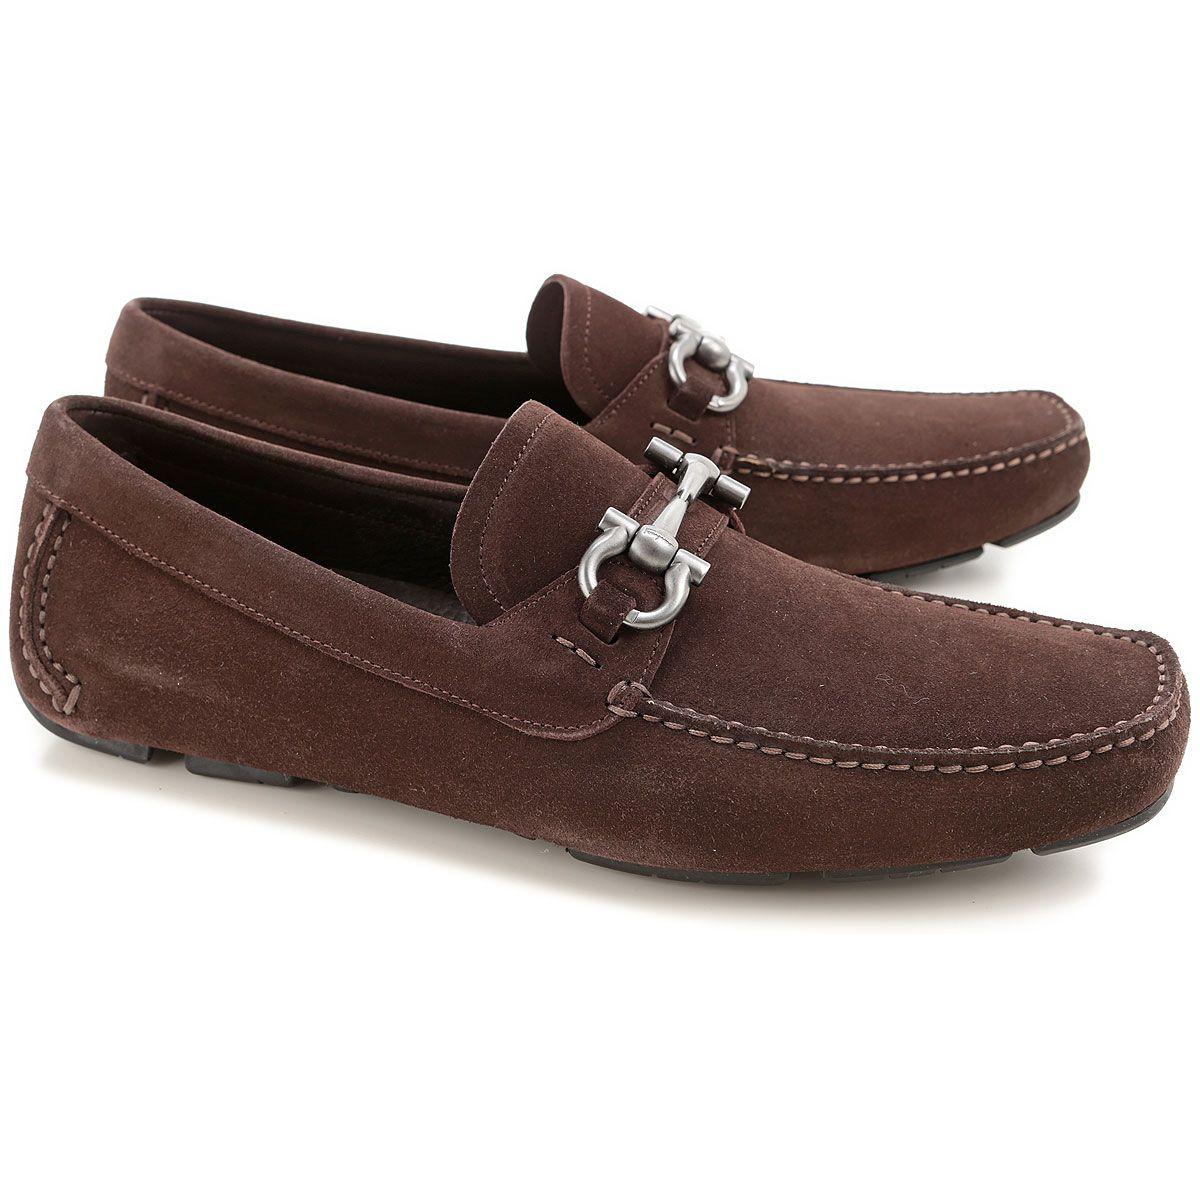 6144c86a Zapatos para Hombres Salvatore Ferragamo, Detalle Modelo: parigi-0582681-